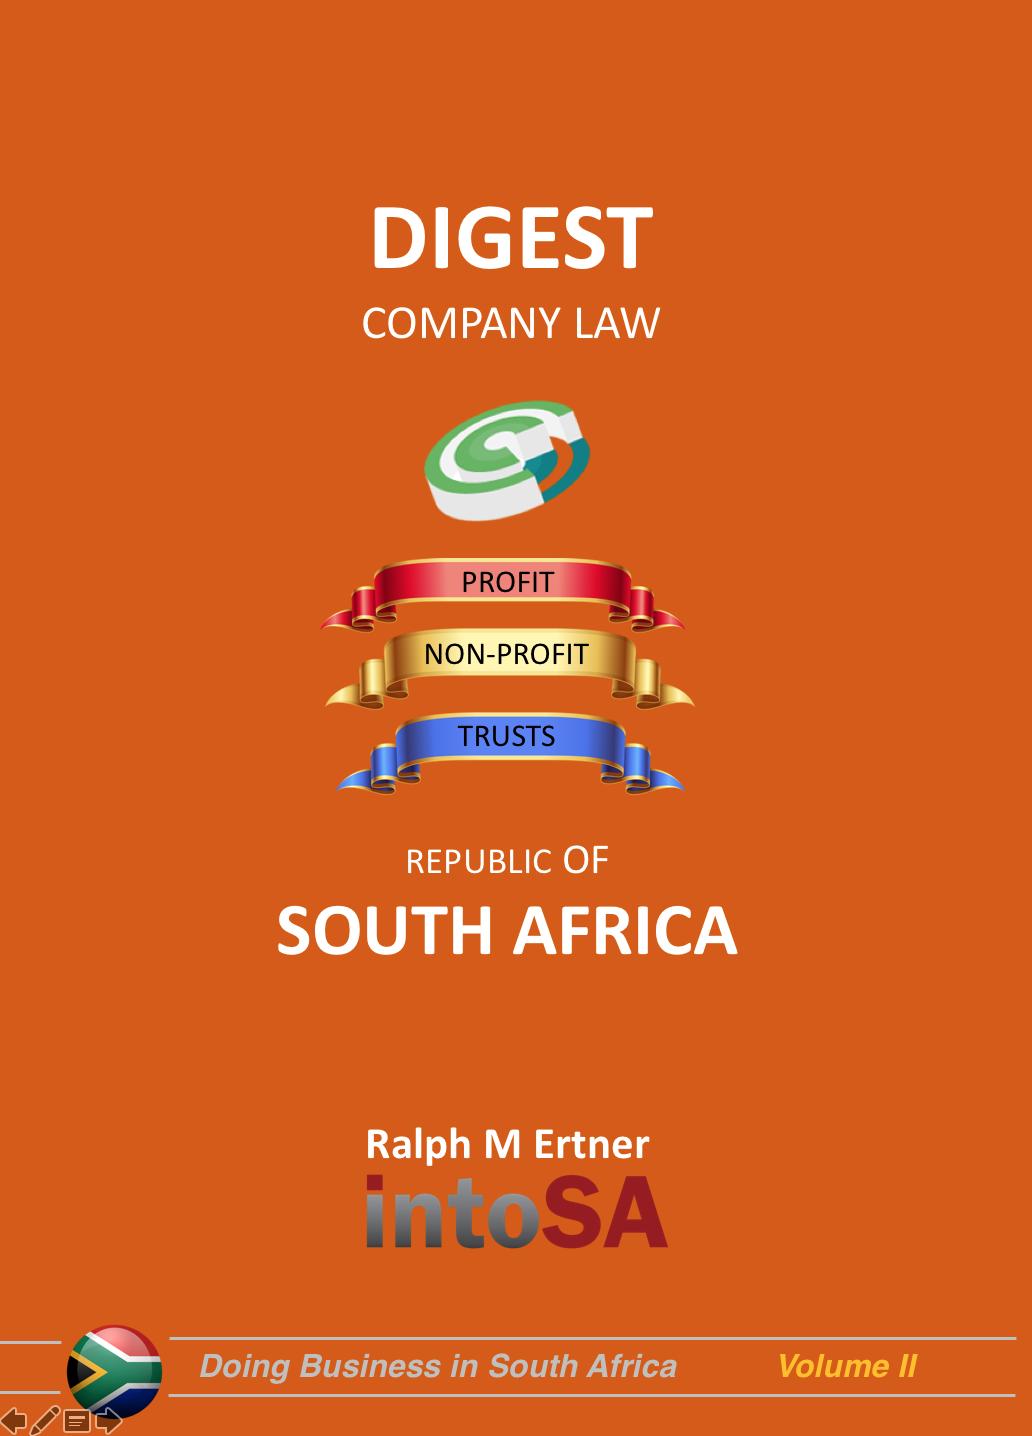 Into SA Company Law Digest